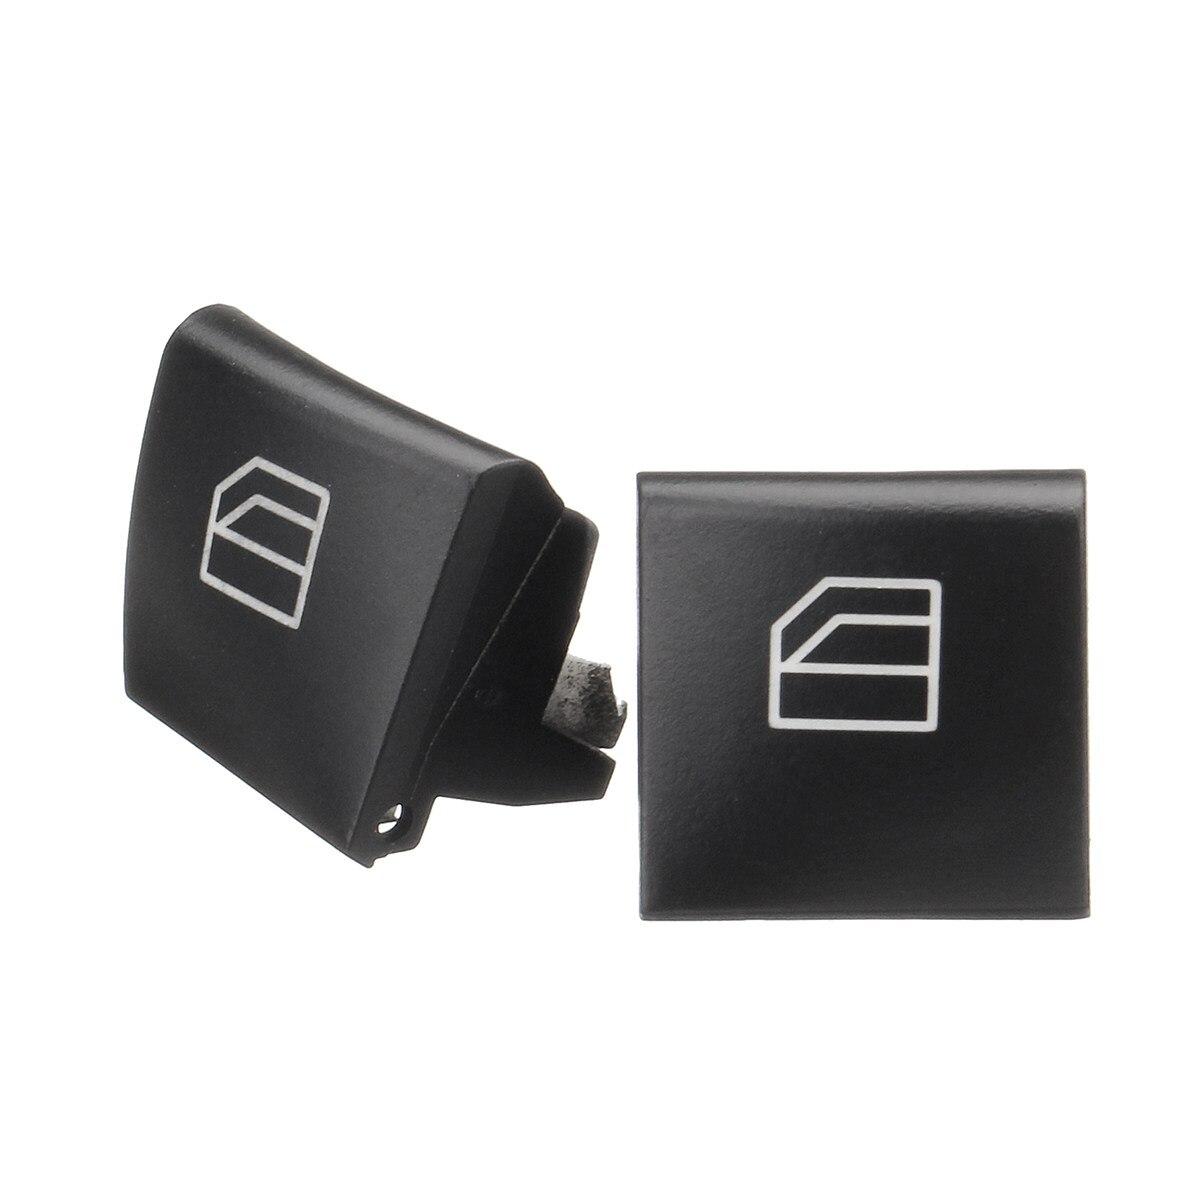 1 Pair Car Window Switch Repair Button Cap Driver Seat Window Control Switch for Mercedes ML GL R Class W164 X164 W251